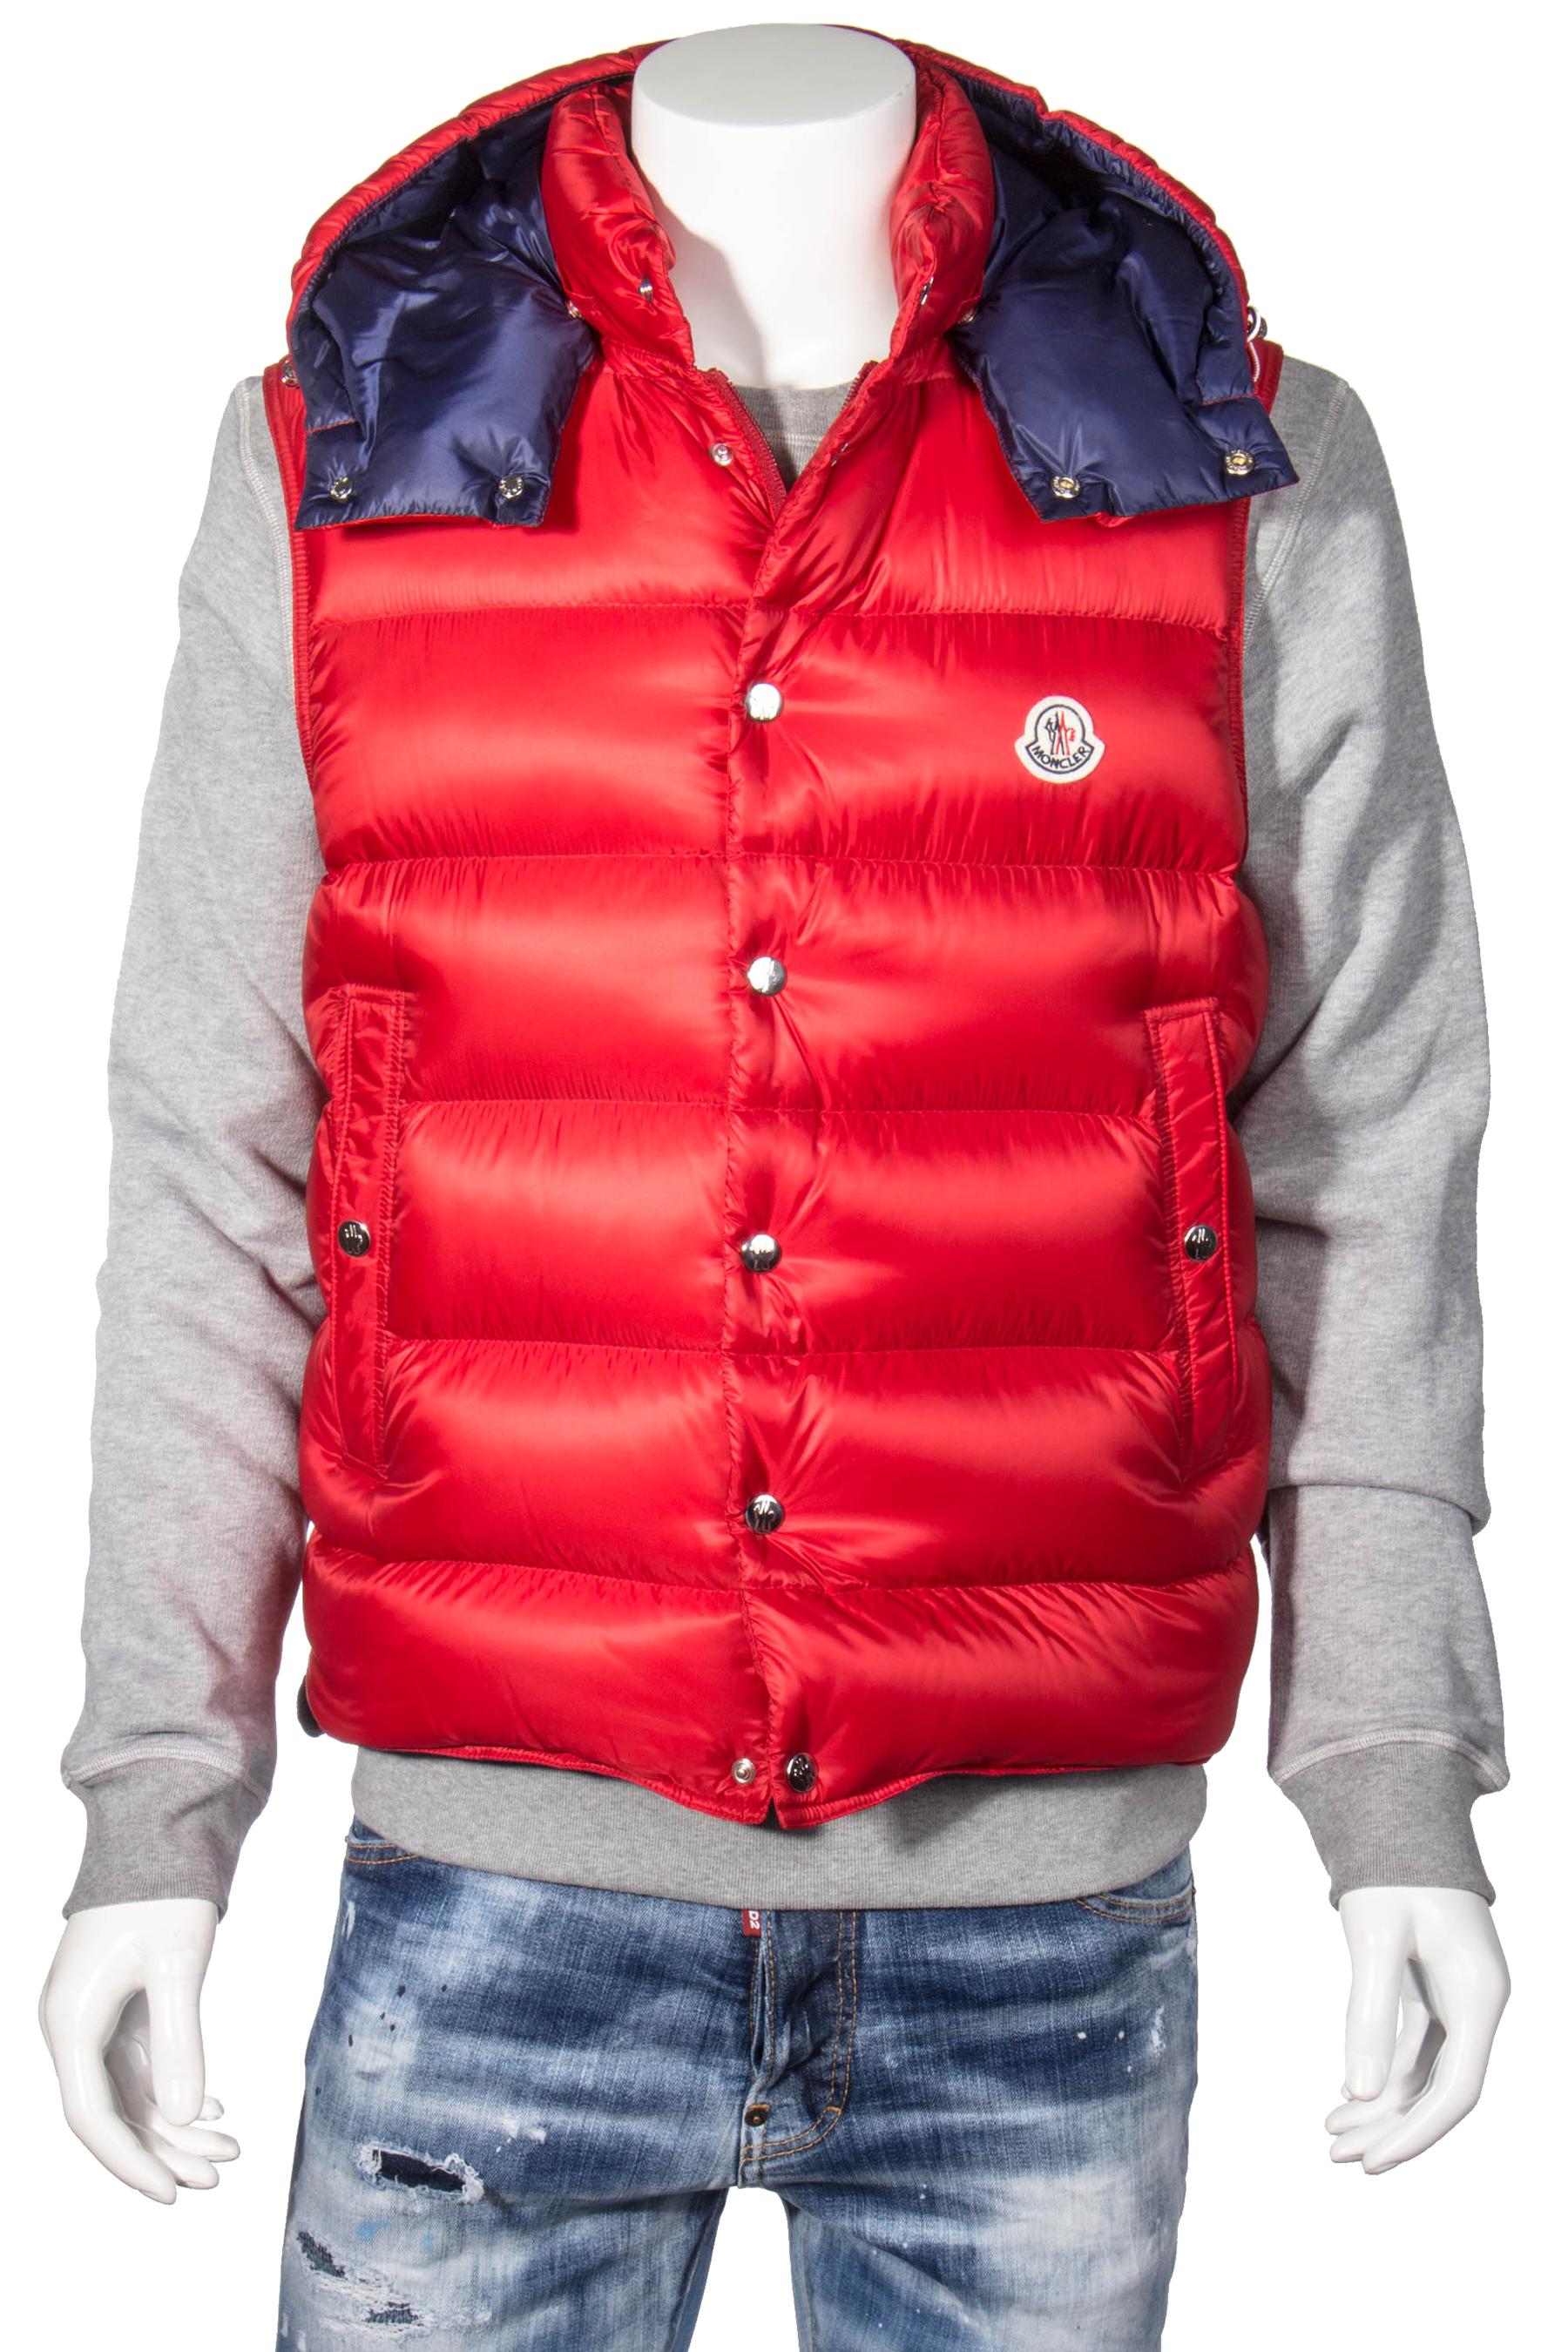 100% authentic bbf96 62bf7 MONCLER Down Vest Billecart